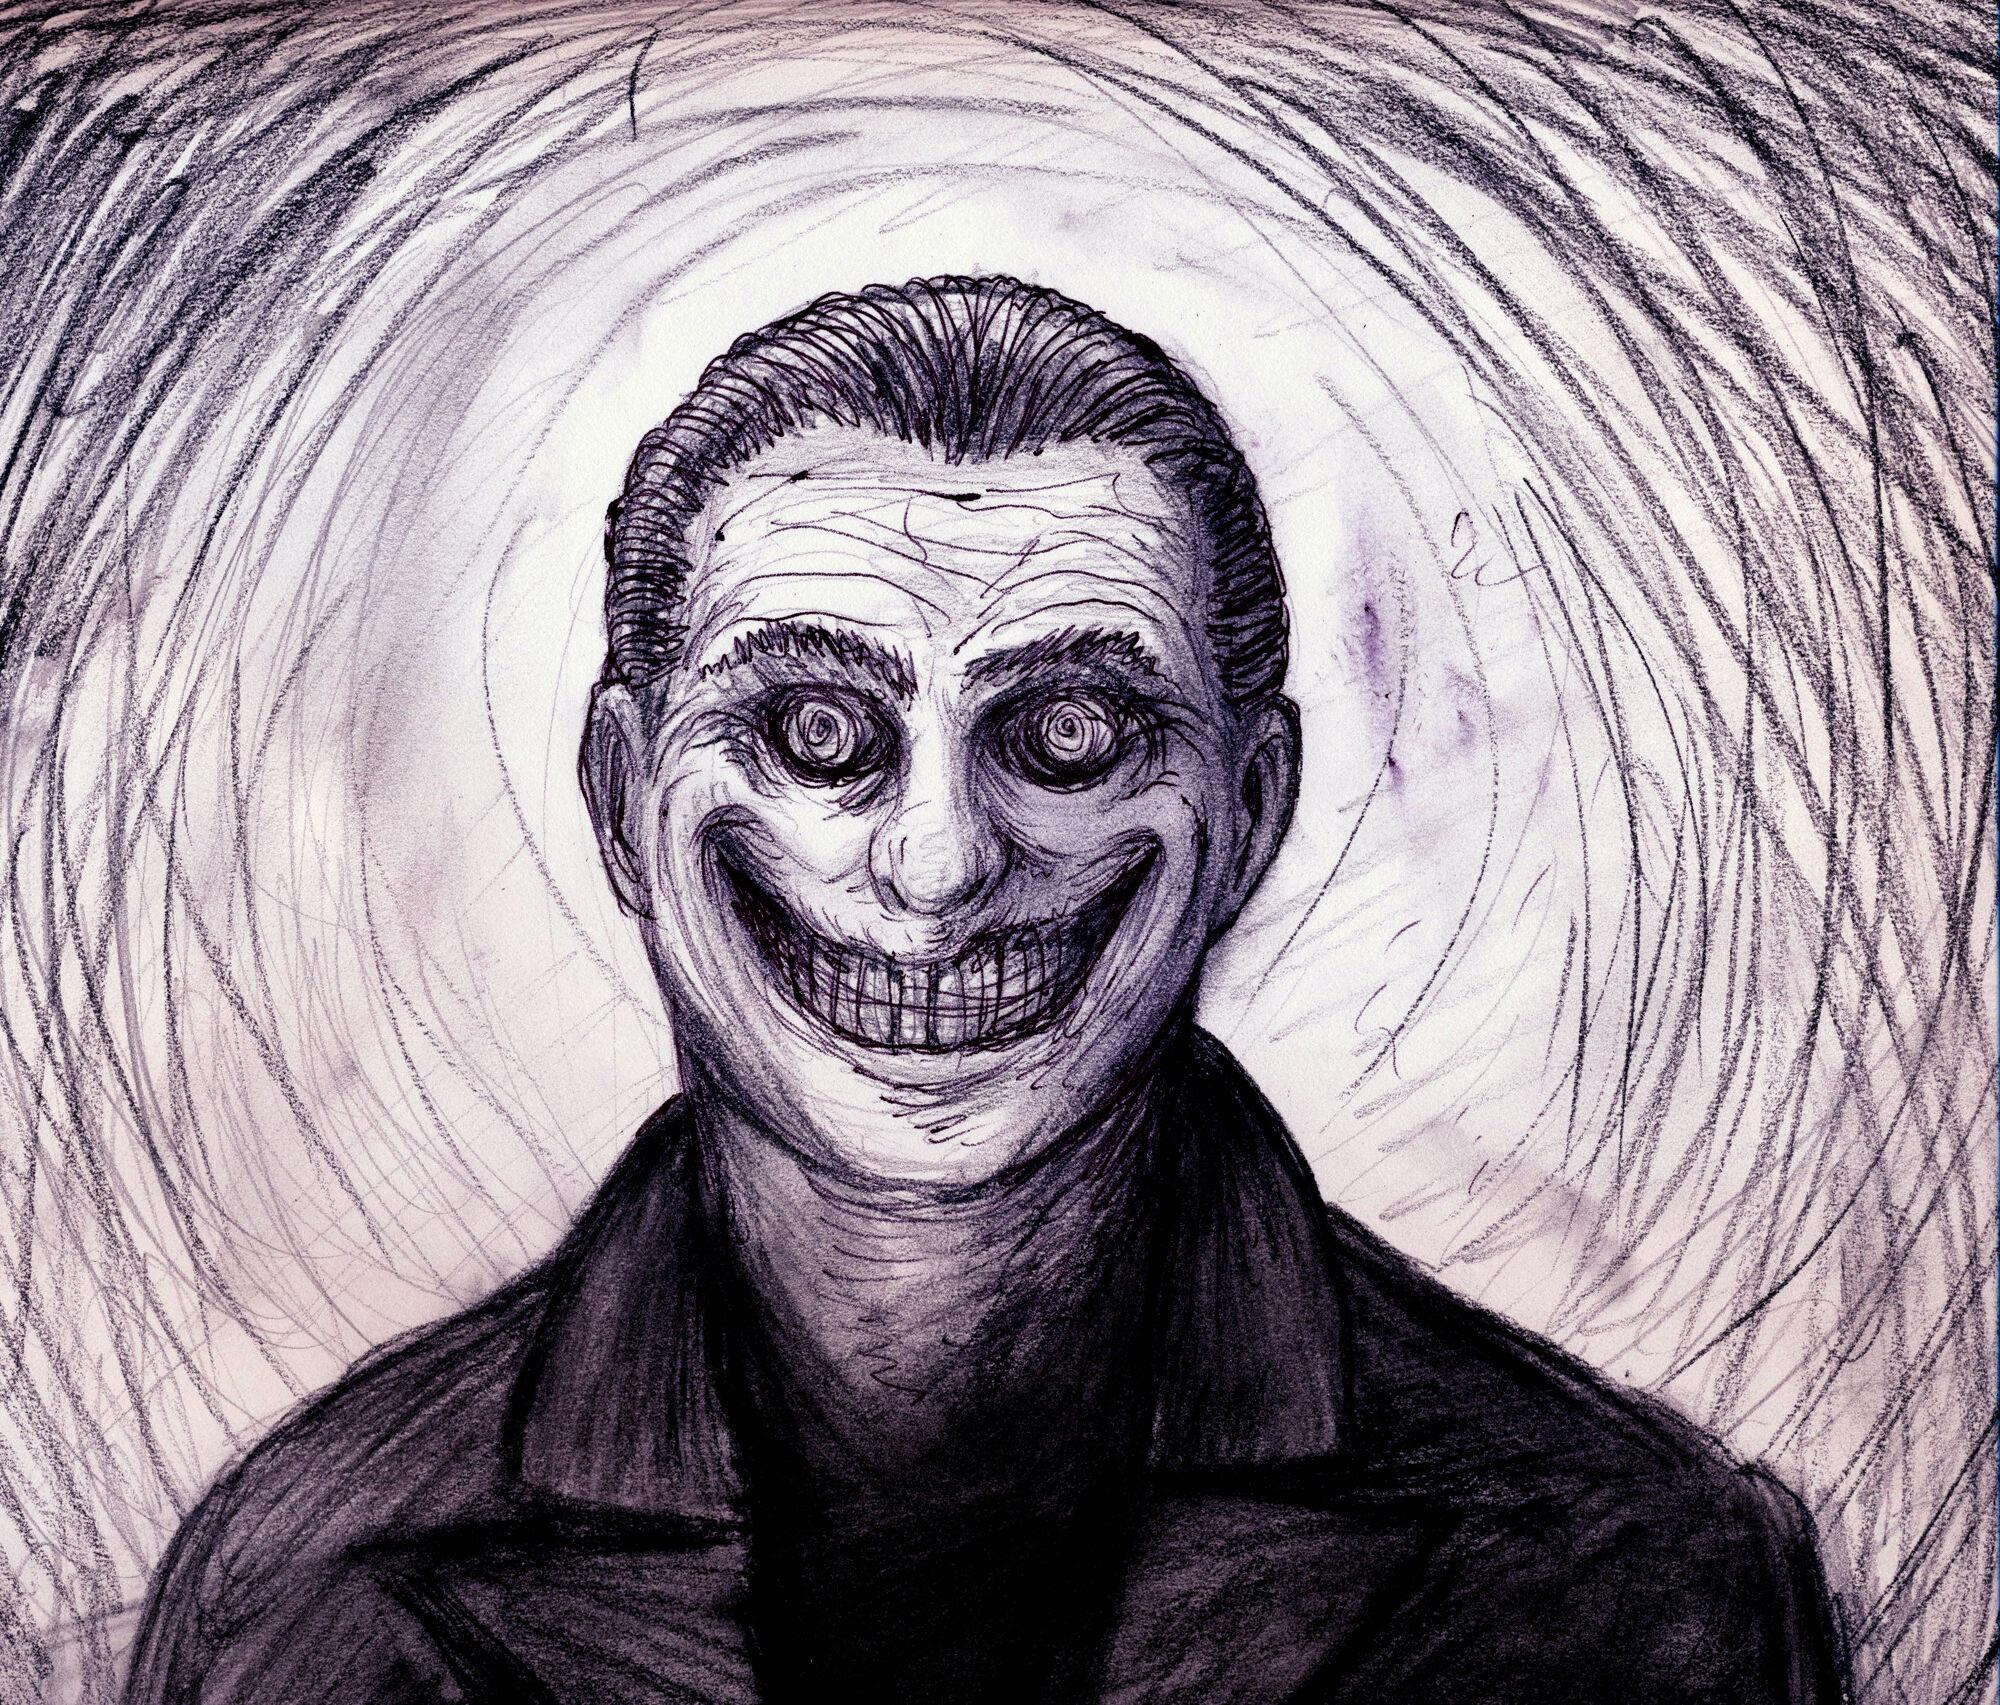 The Smiling Man | Creepypasta Wiki | FANDOM powered by Wikia